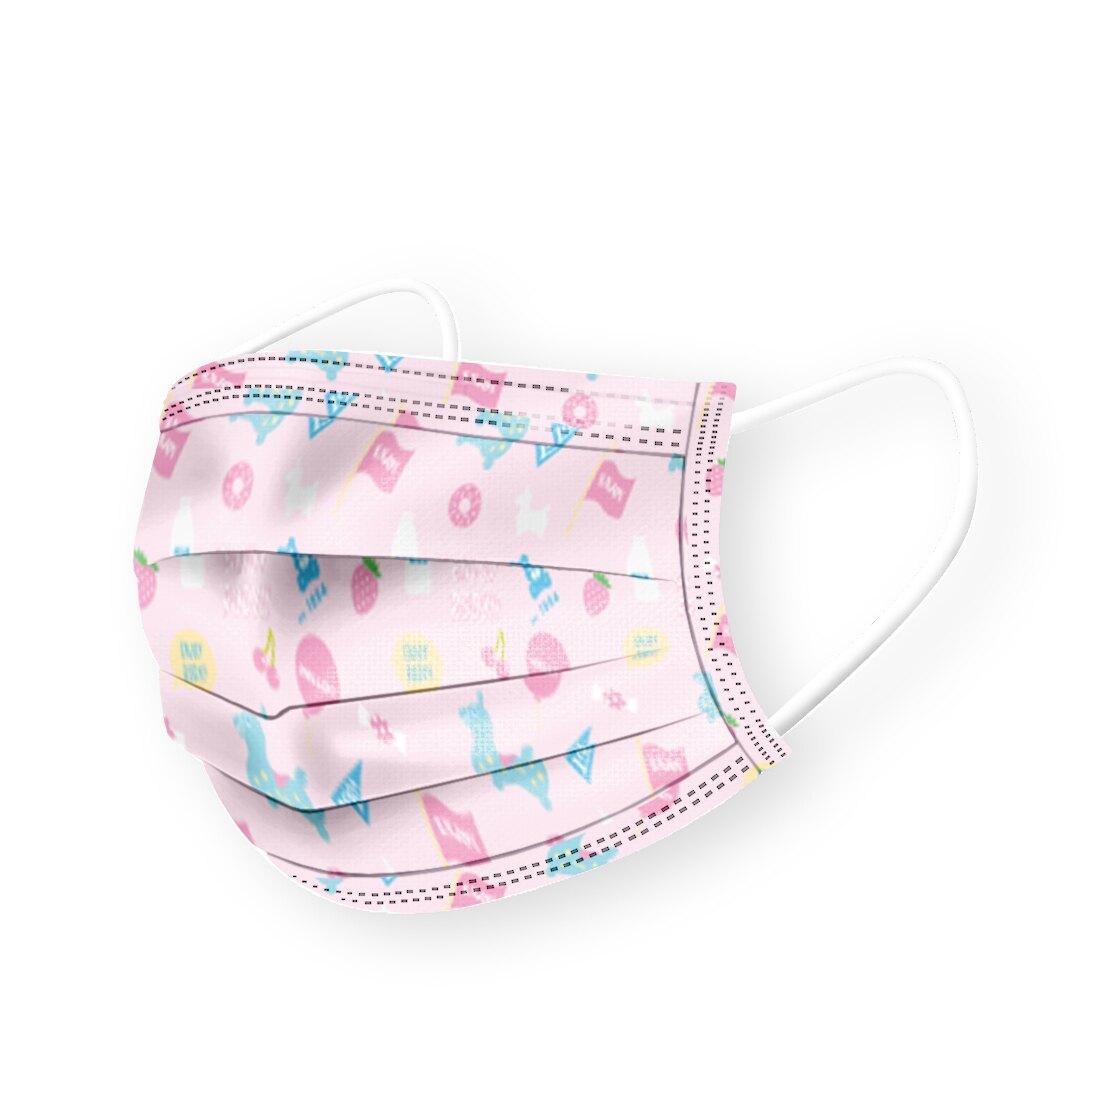 RODY 成人醫療平面口罩-粉色 (30入/盒)【杏一】